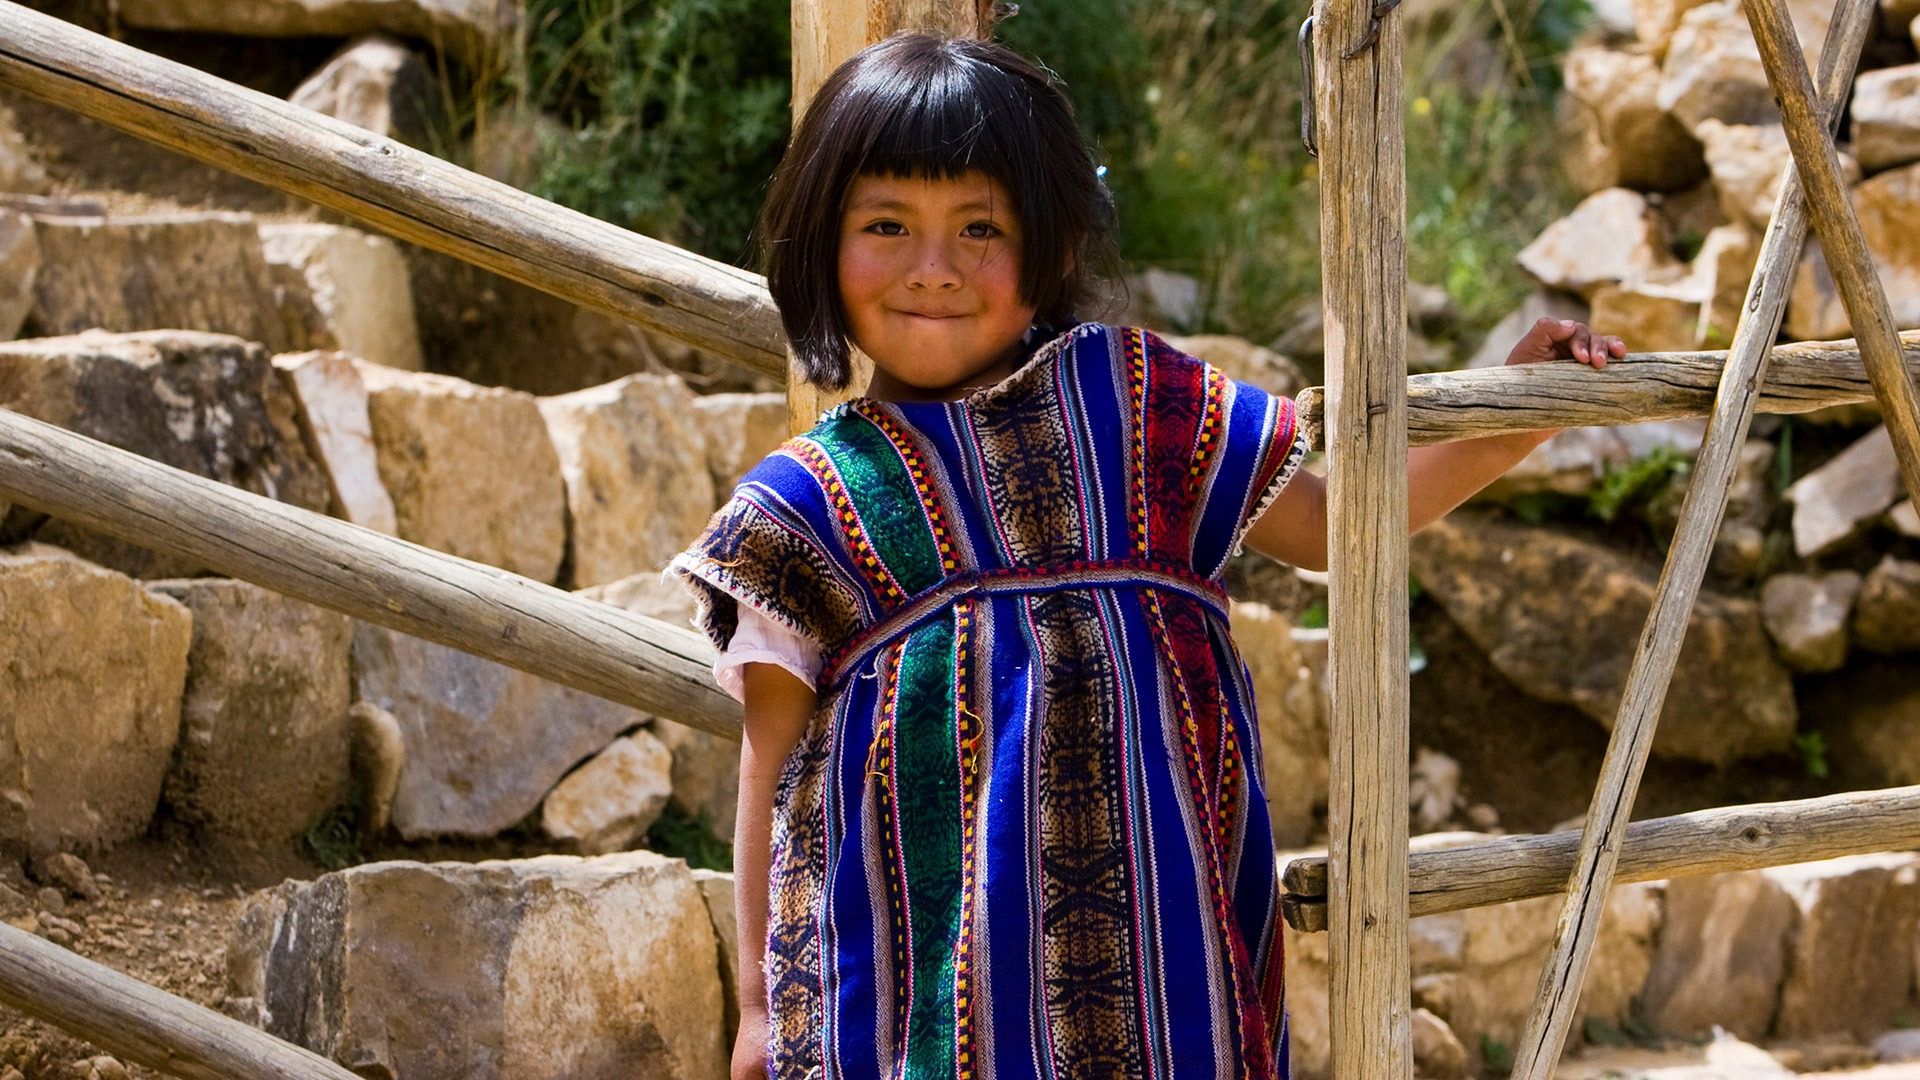 An Aymara girl on Isla del Sol in Lake Titicaca, Bolivia